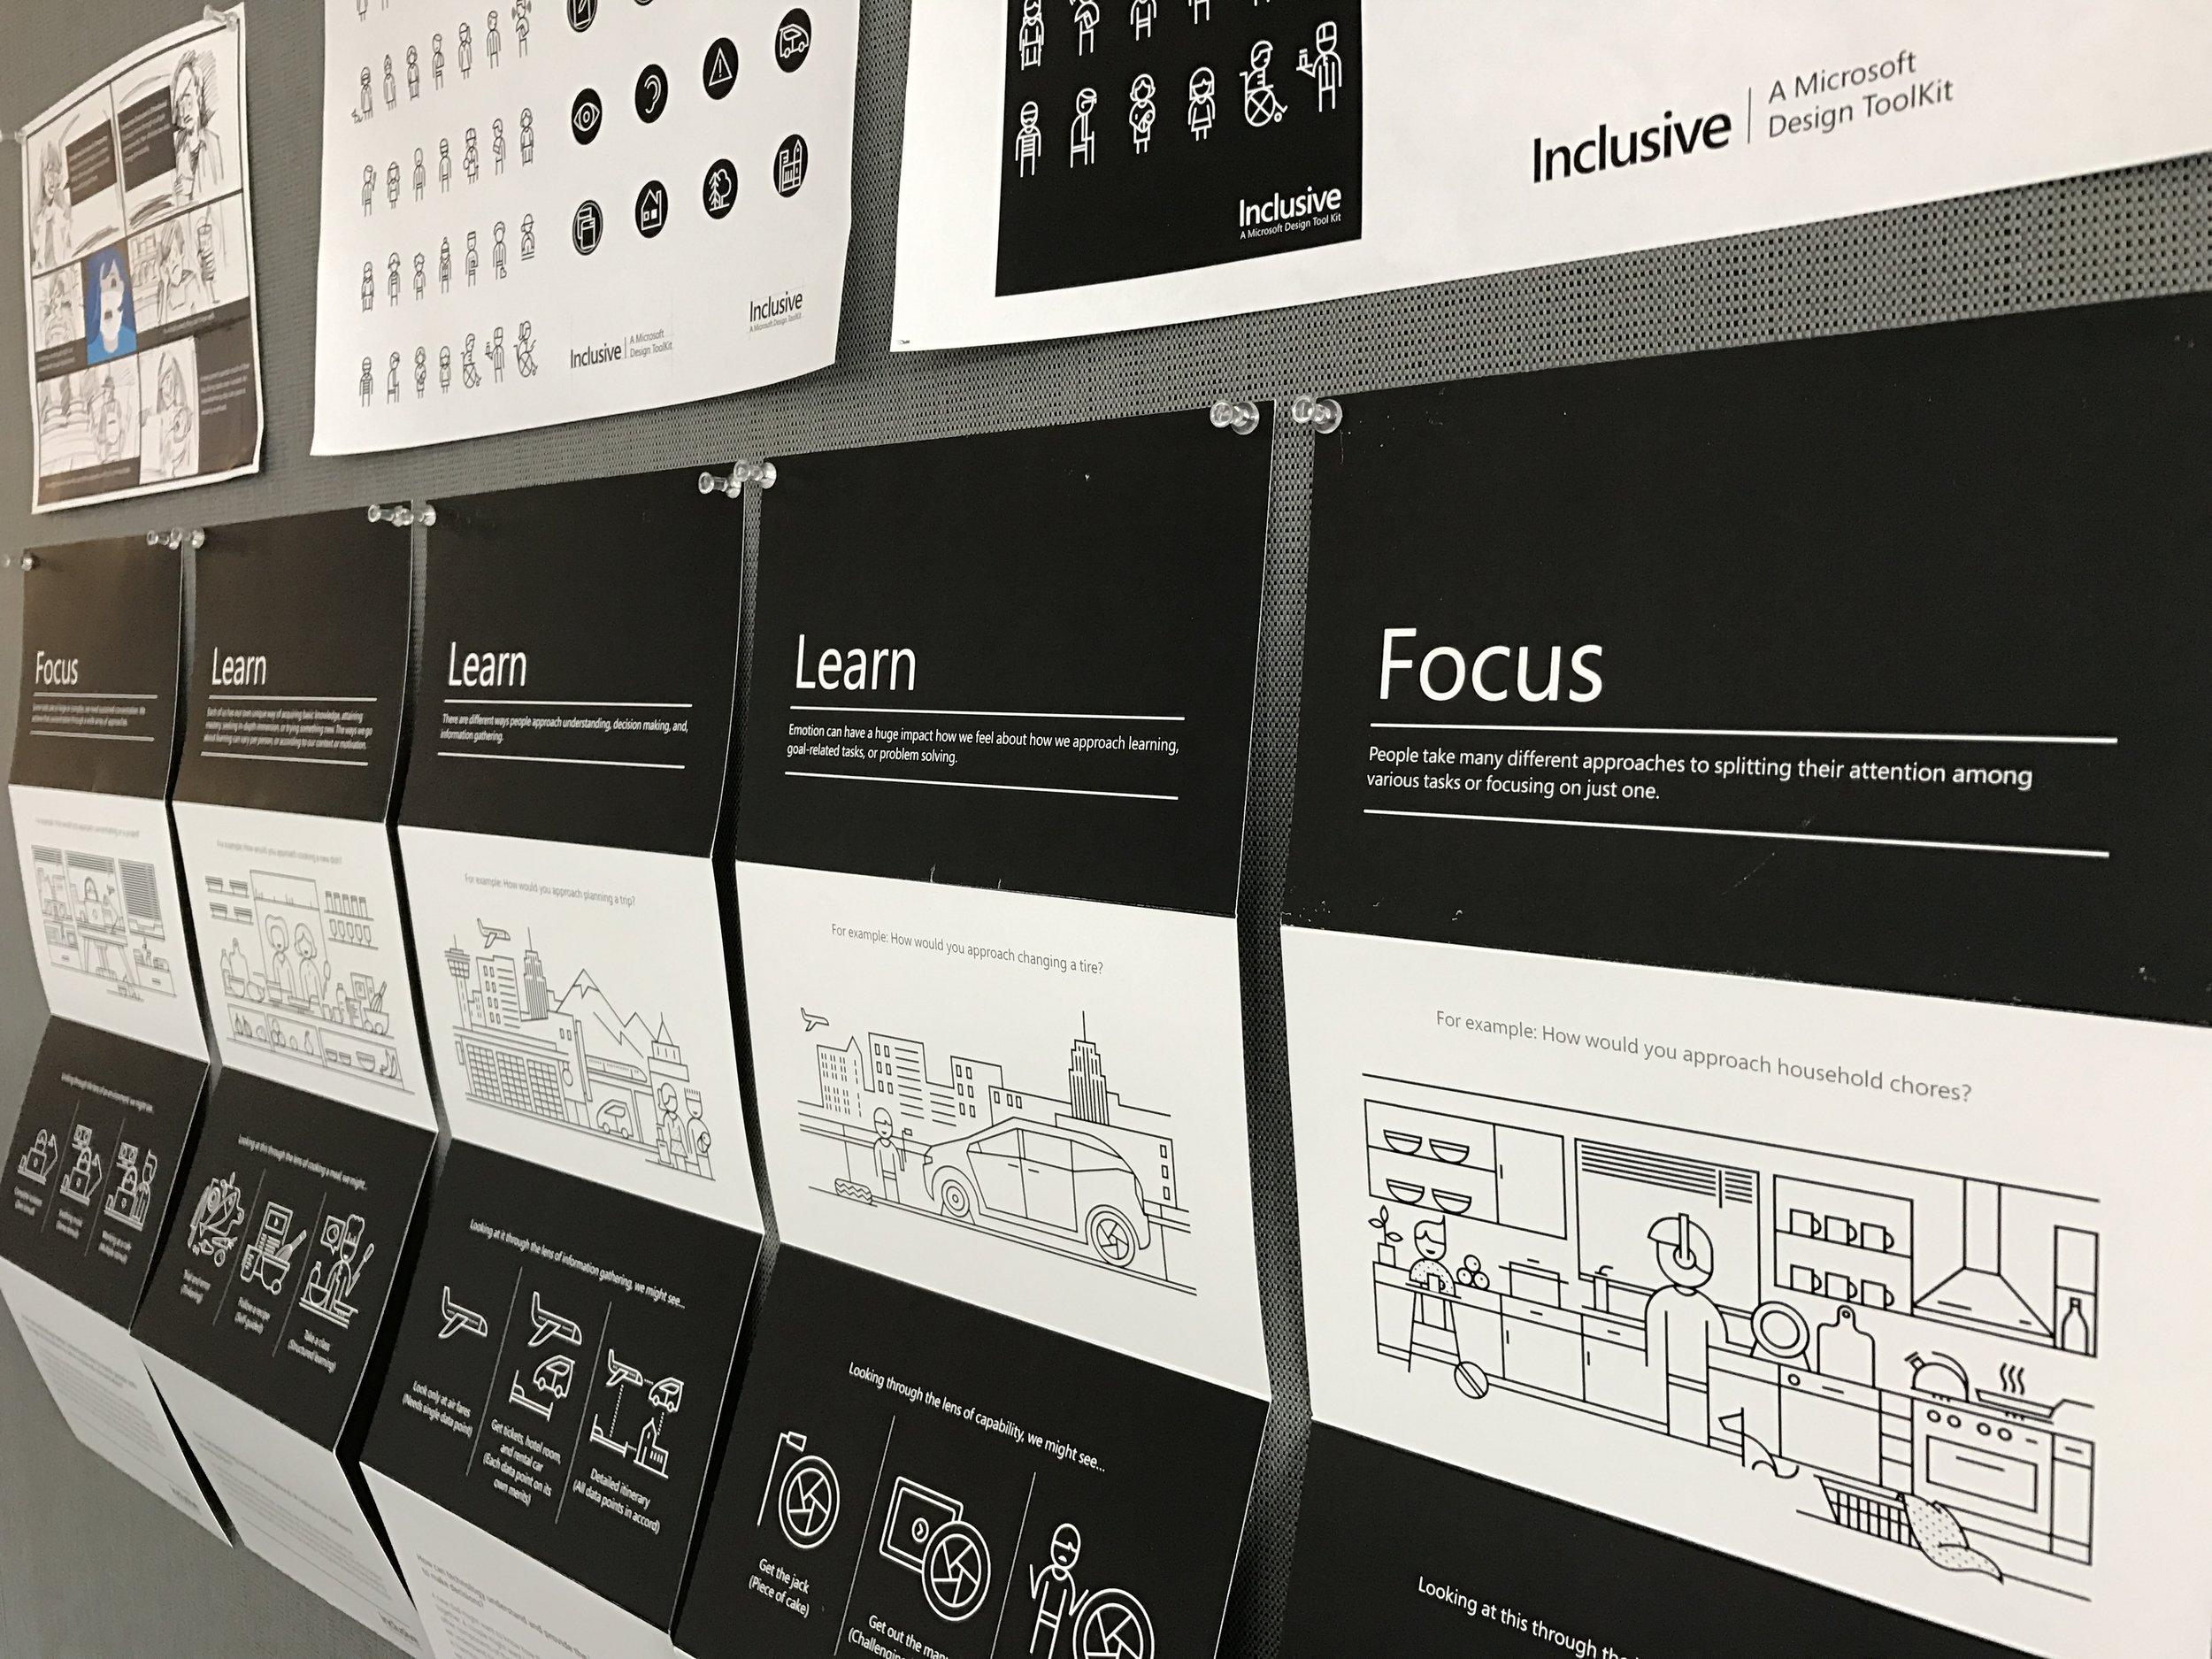 toolkit_learn.JPG